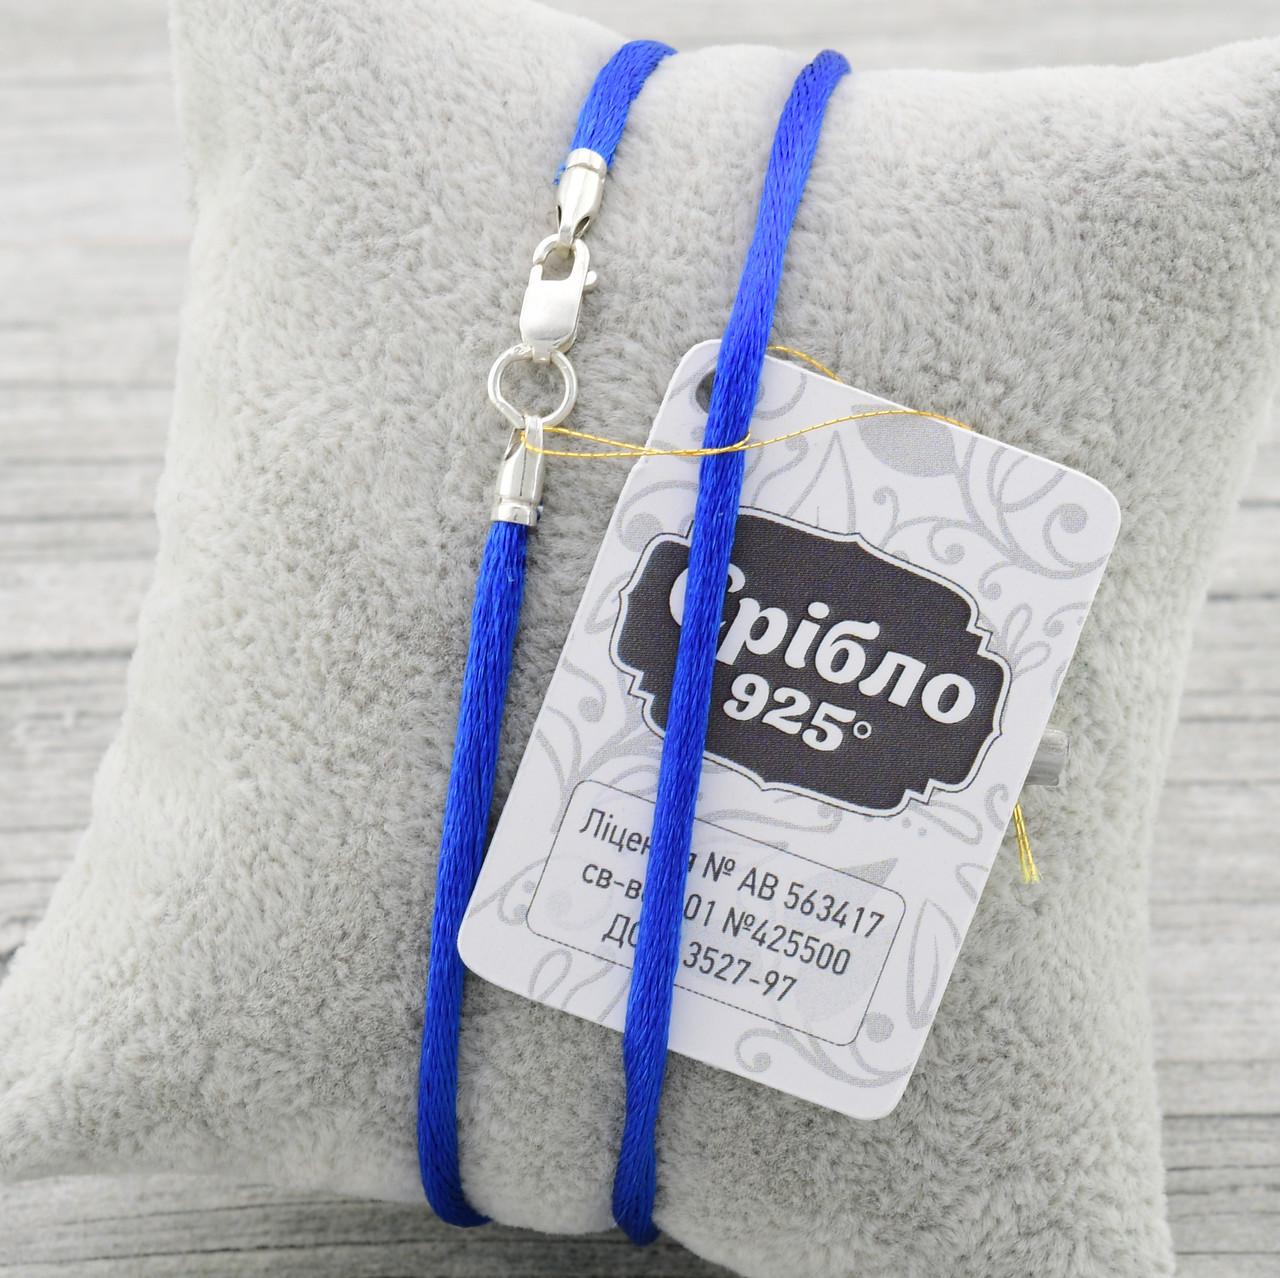 Шнурок шелковый цвет синий длина 40 см ширина 2 мм вес серебра 0.7 г